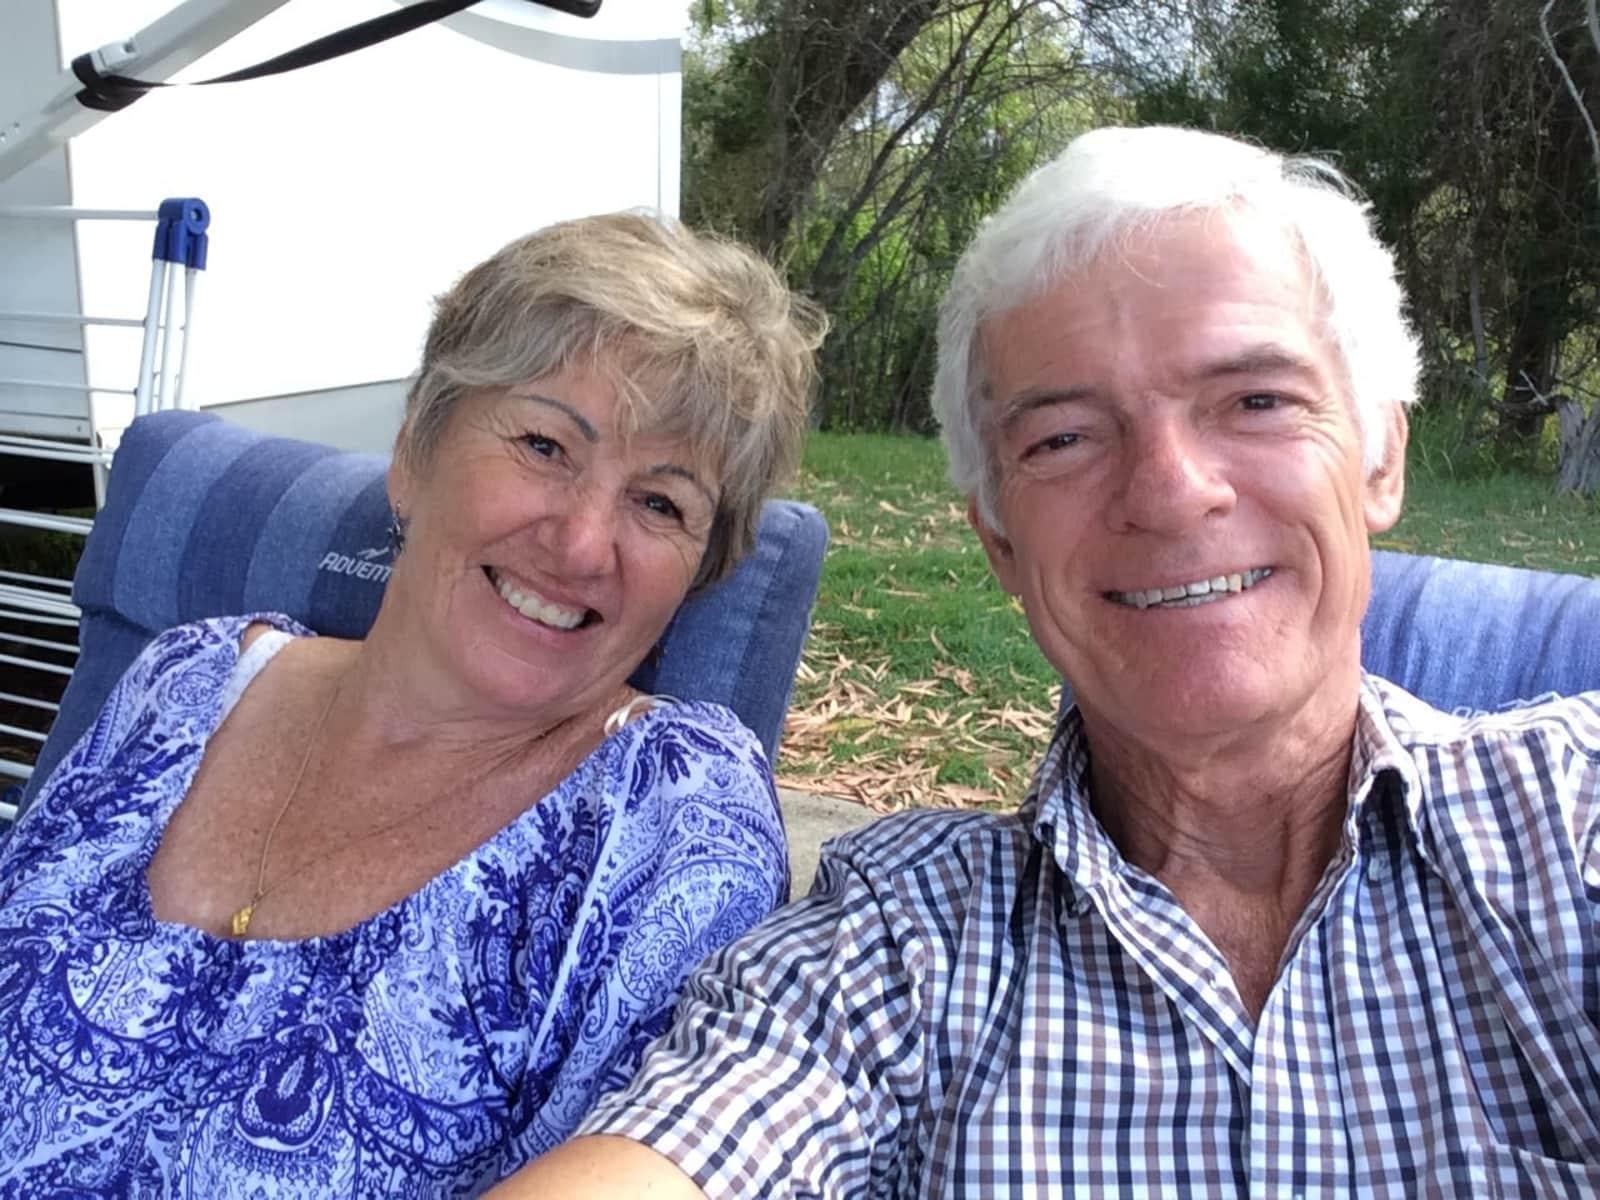 Marilyn & John from Brisbane, Queensland, Australia